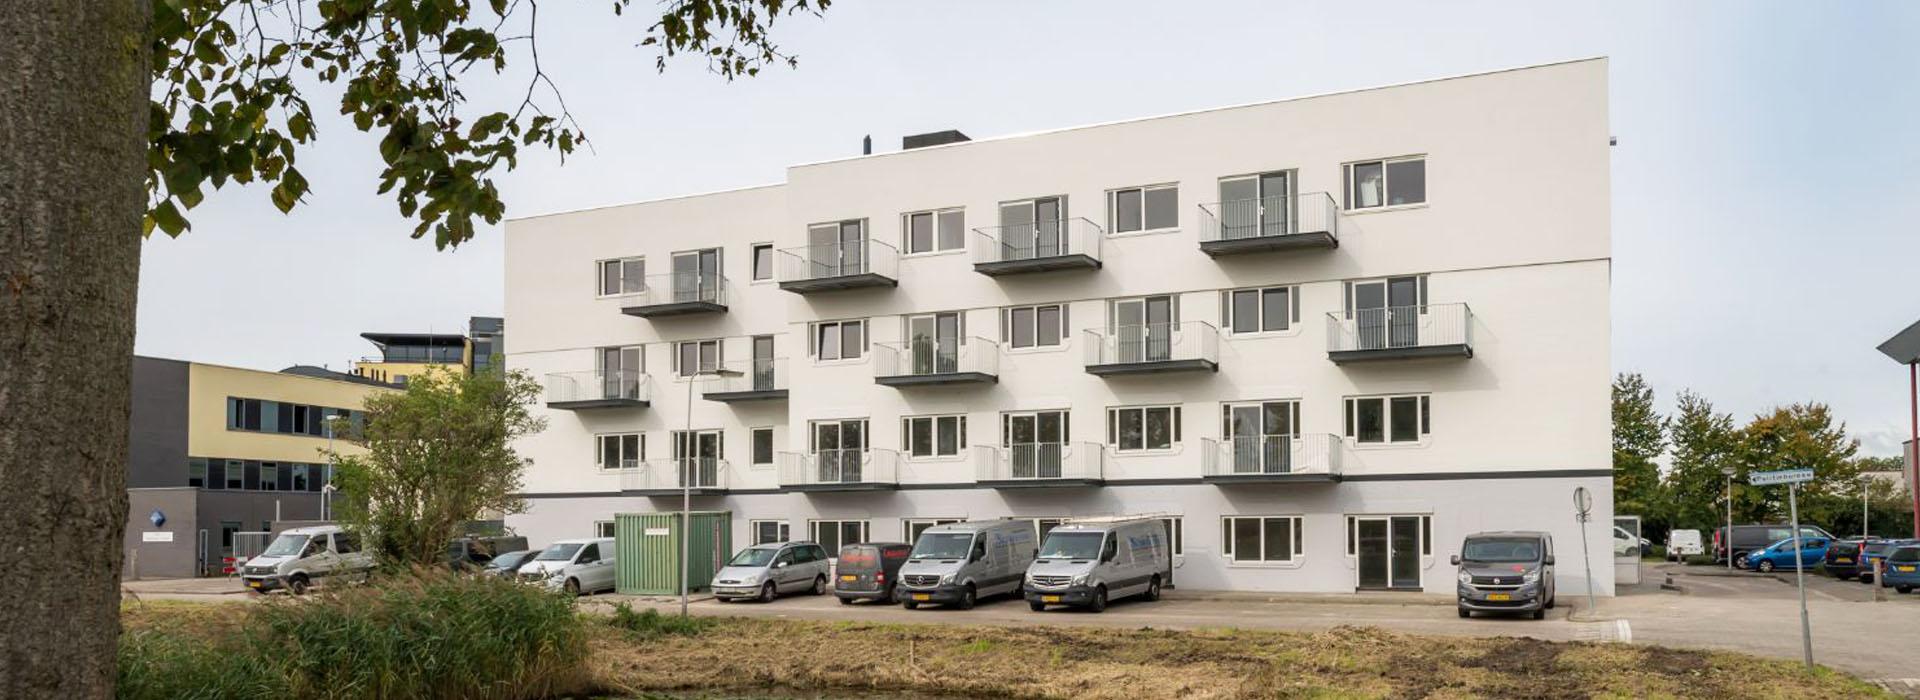 white residential building limawonen